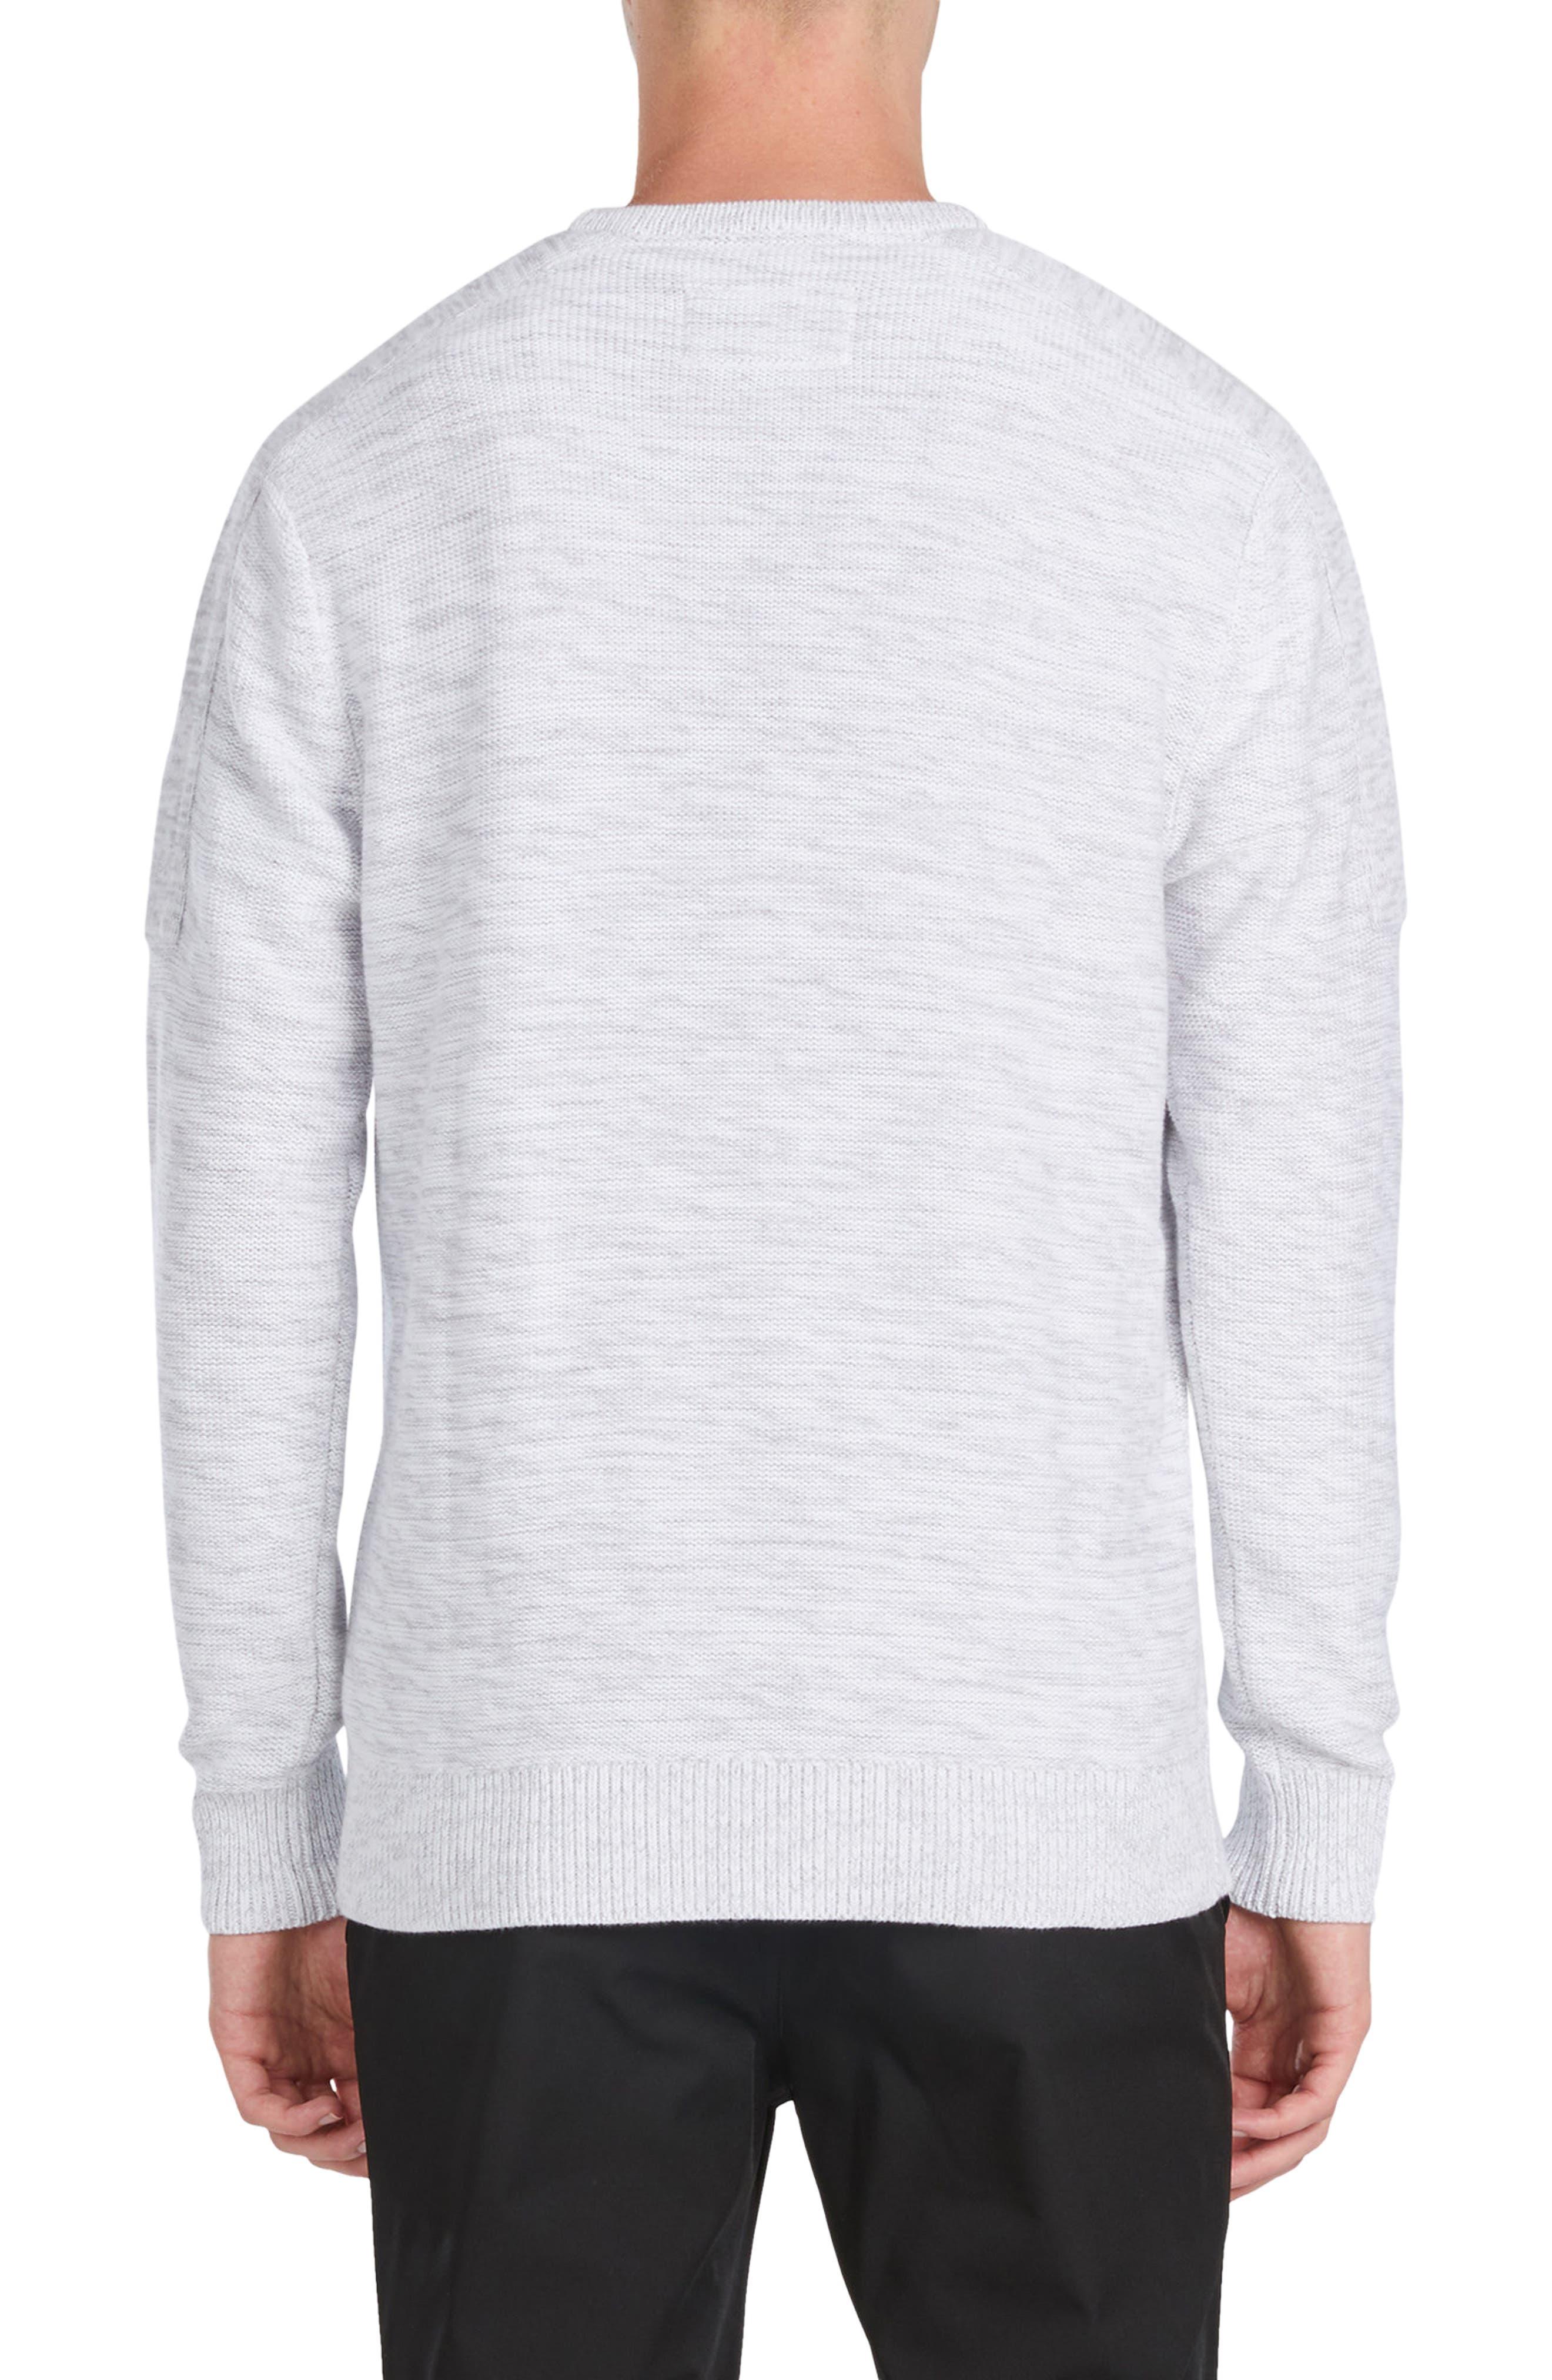 Tube Crew Cotton Sweater,                             Alternate thumbnail 2, color,                             051